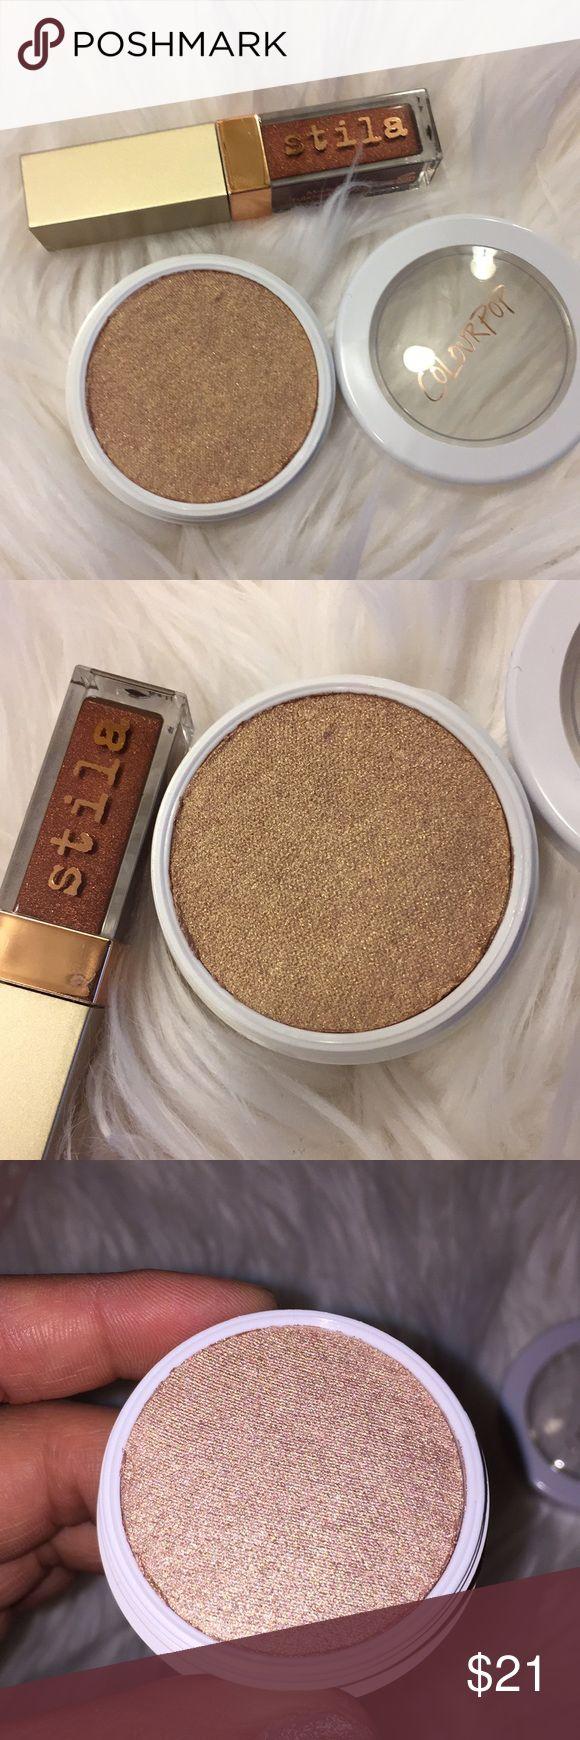 best 25+ skin glow cream ideas on pinterest | flawless foundation